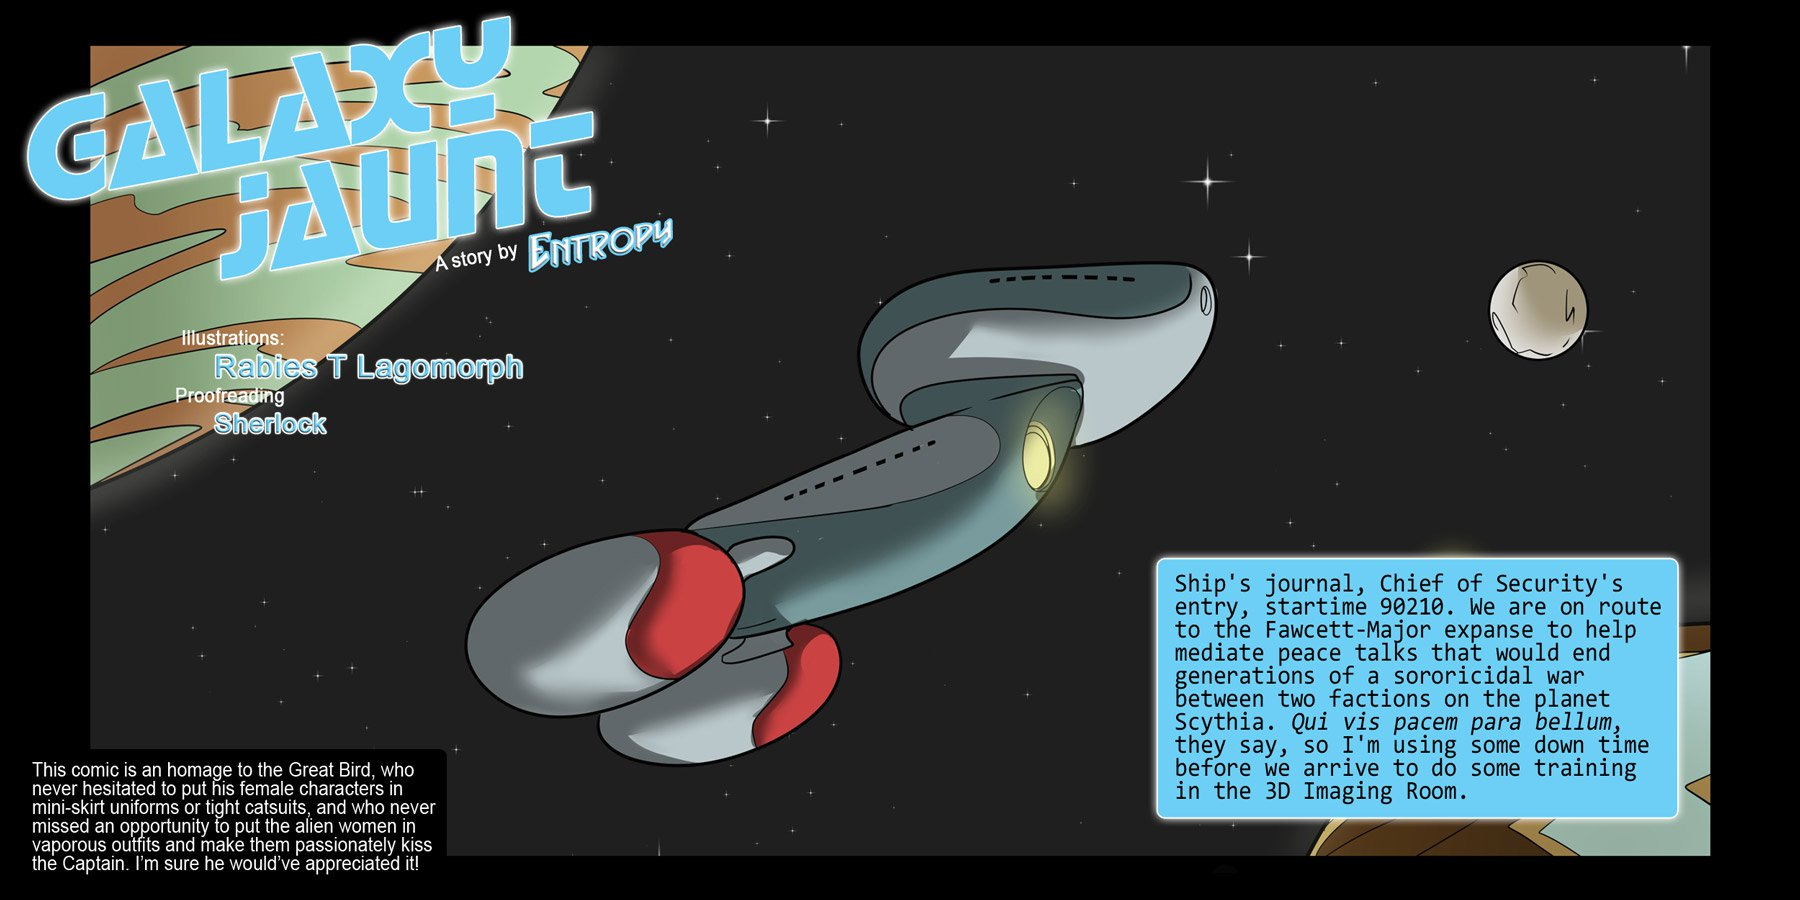 SureFap xxx porno Star Trek - [Rabies T Lagomorph (Entropy)] - Galaxy Jaunt - Episode 2